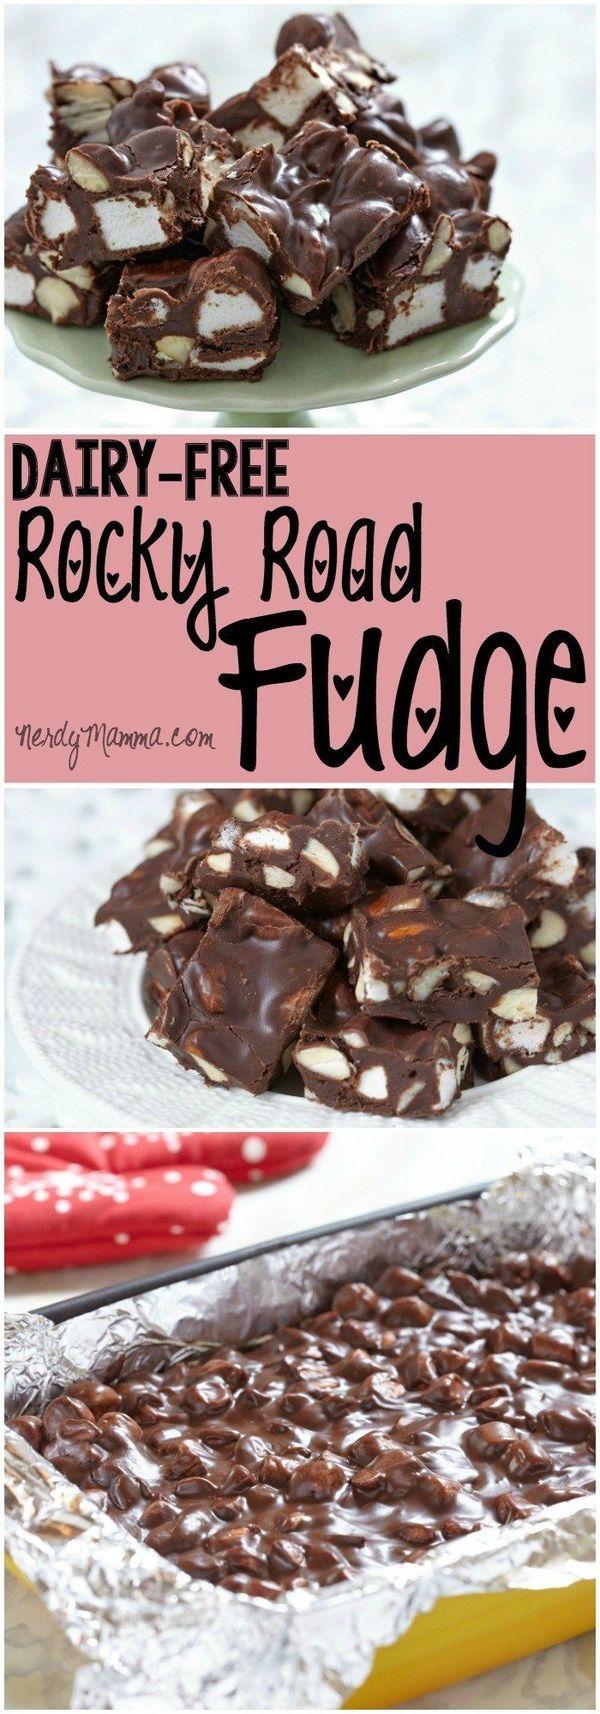 Dairy-Free Rocky Road Fudge